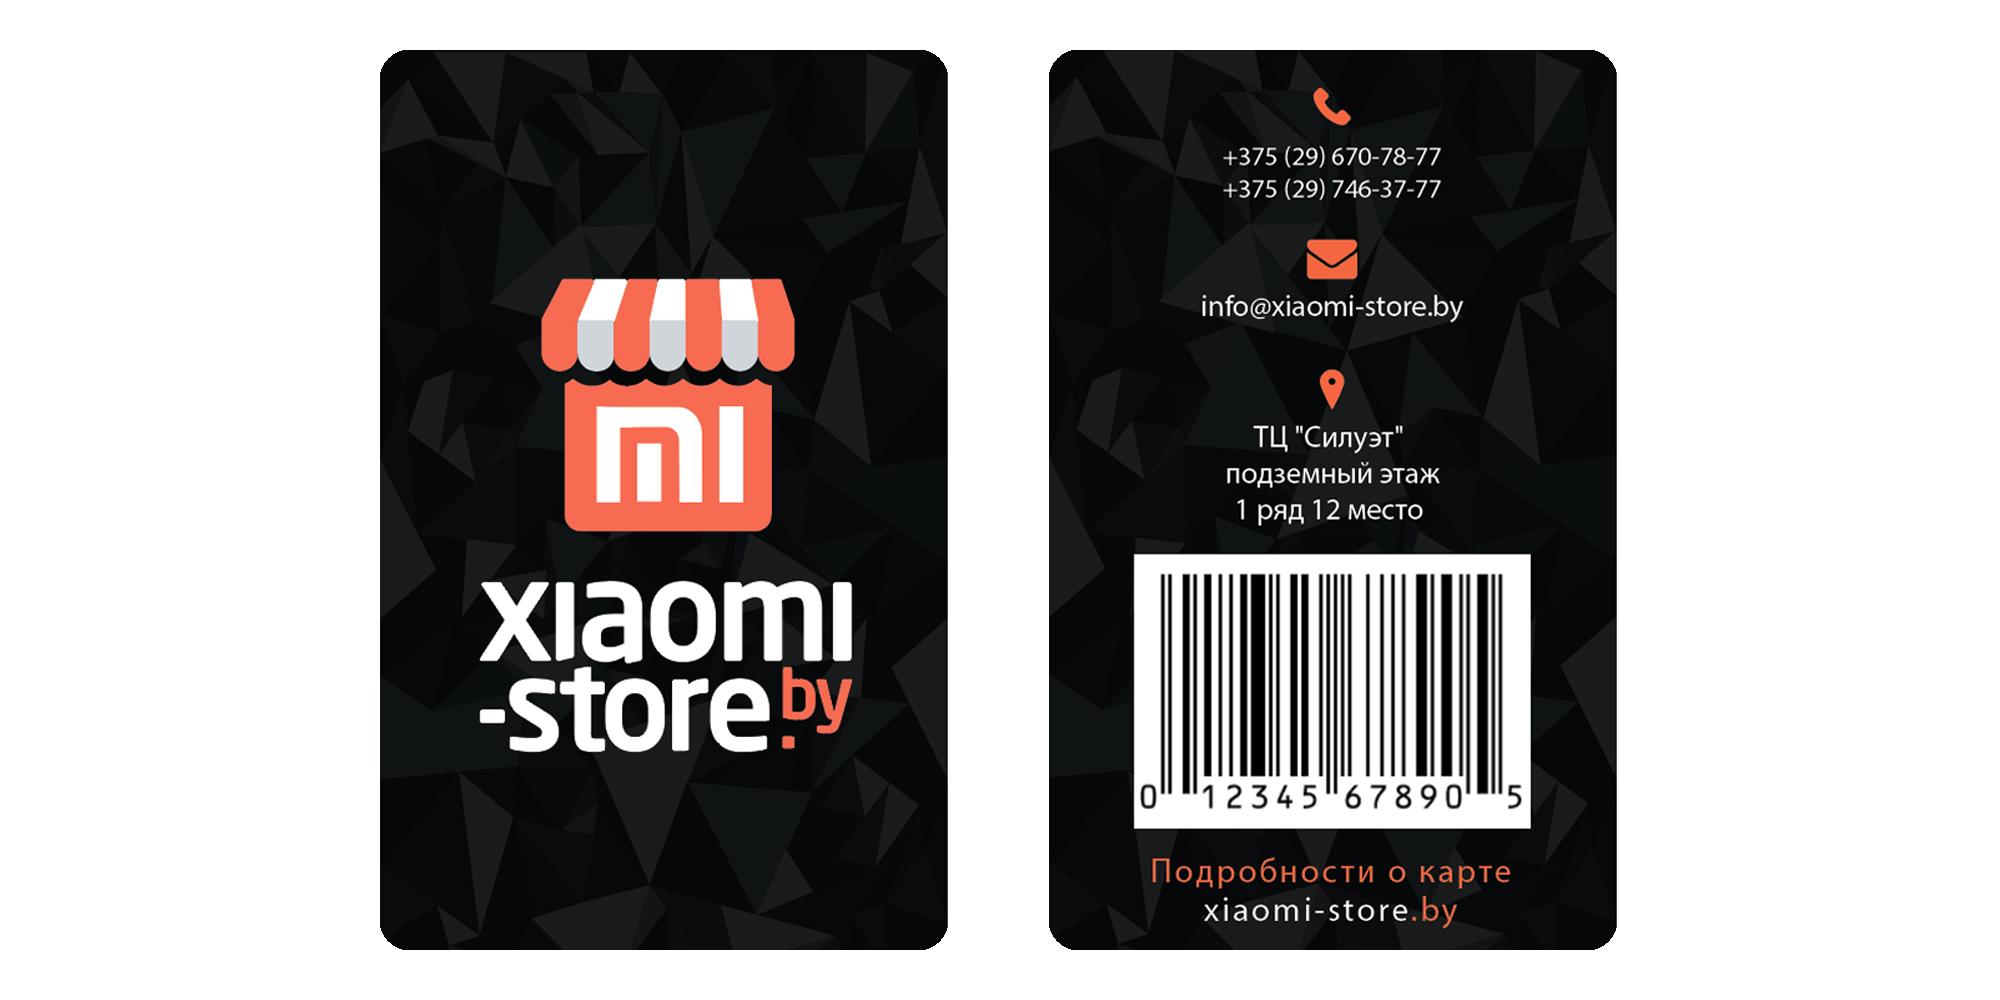 Дисконтная карта Xiaomi-sotre.by